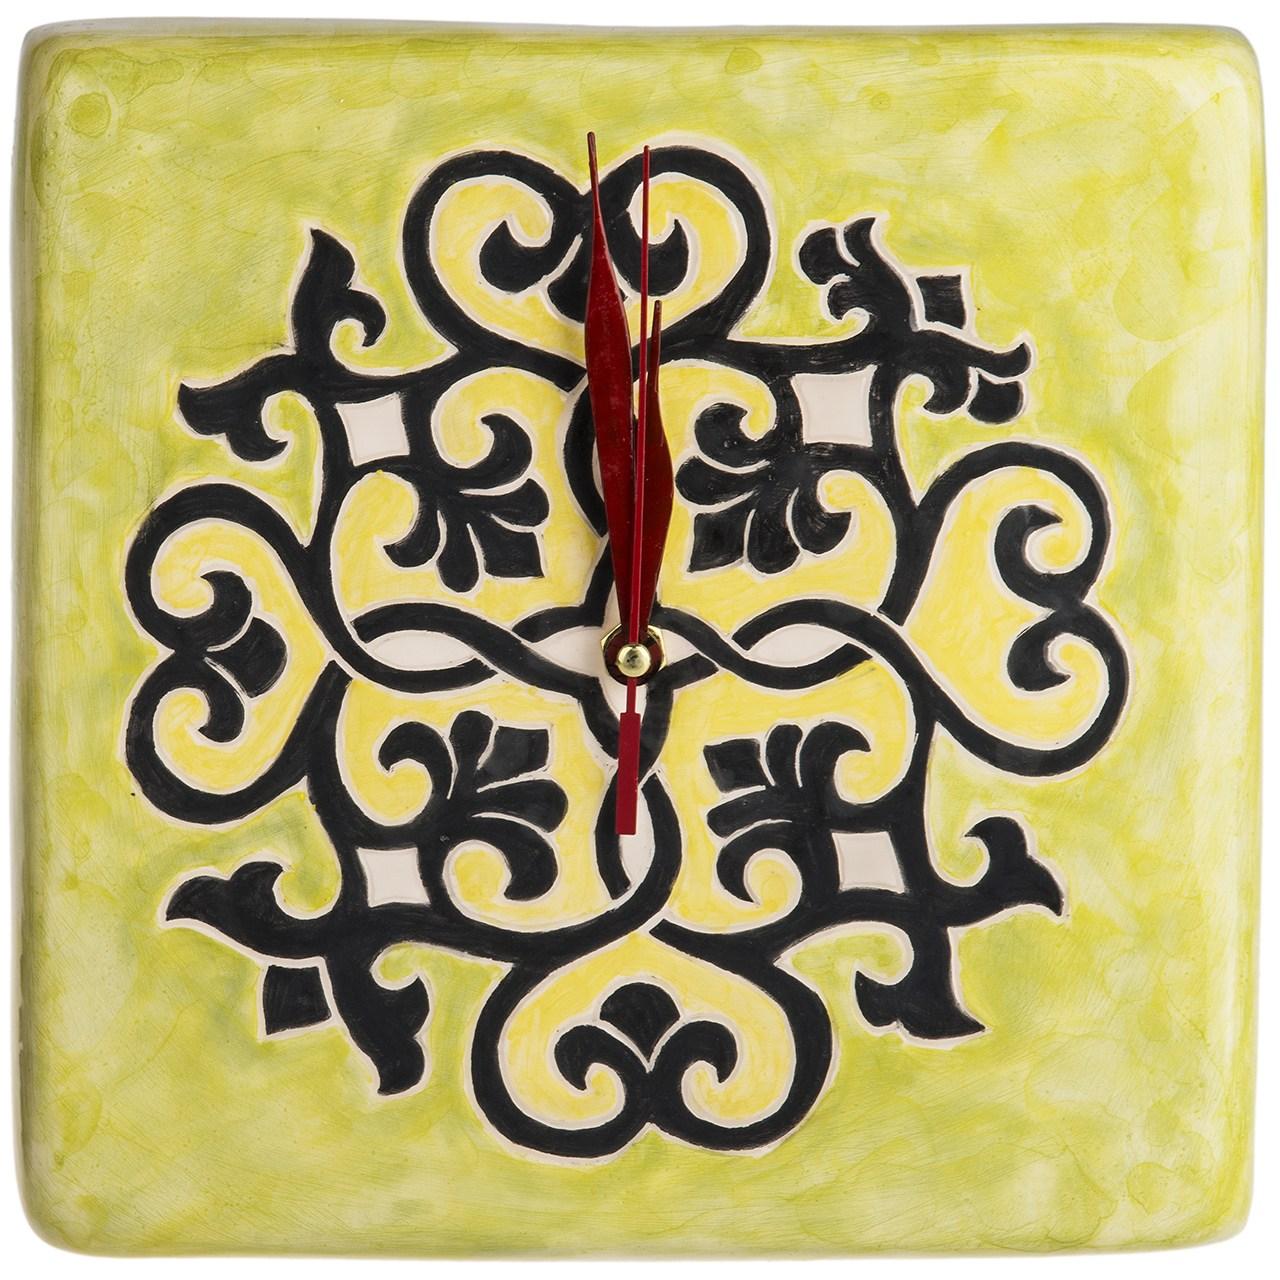 ساعت سرامیکی گالری اروشا مدل مربعی طرح اسلیمی